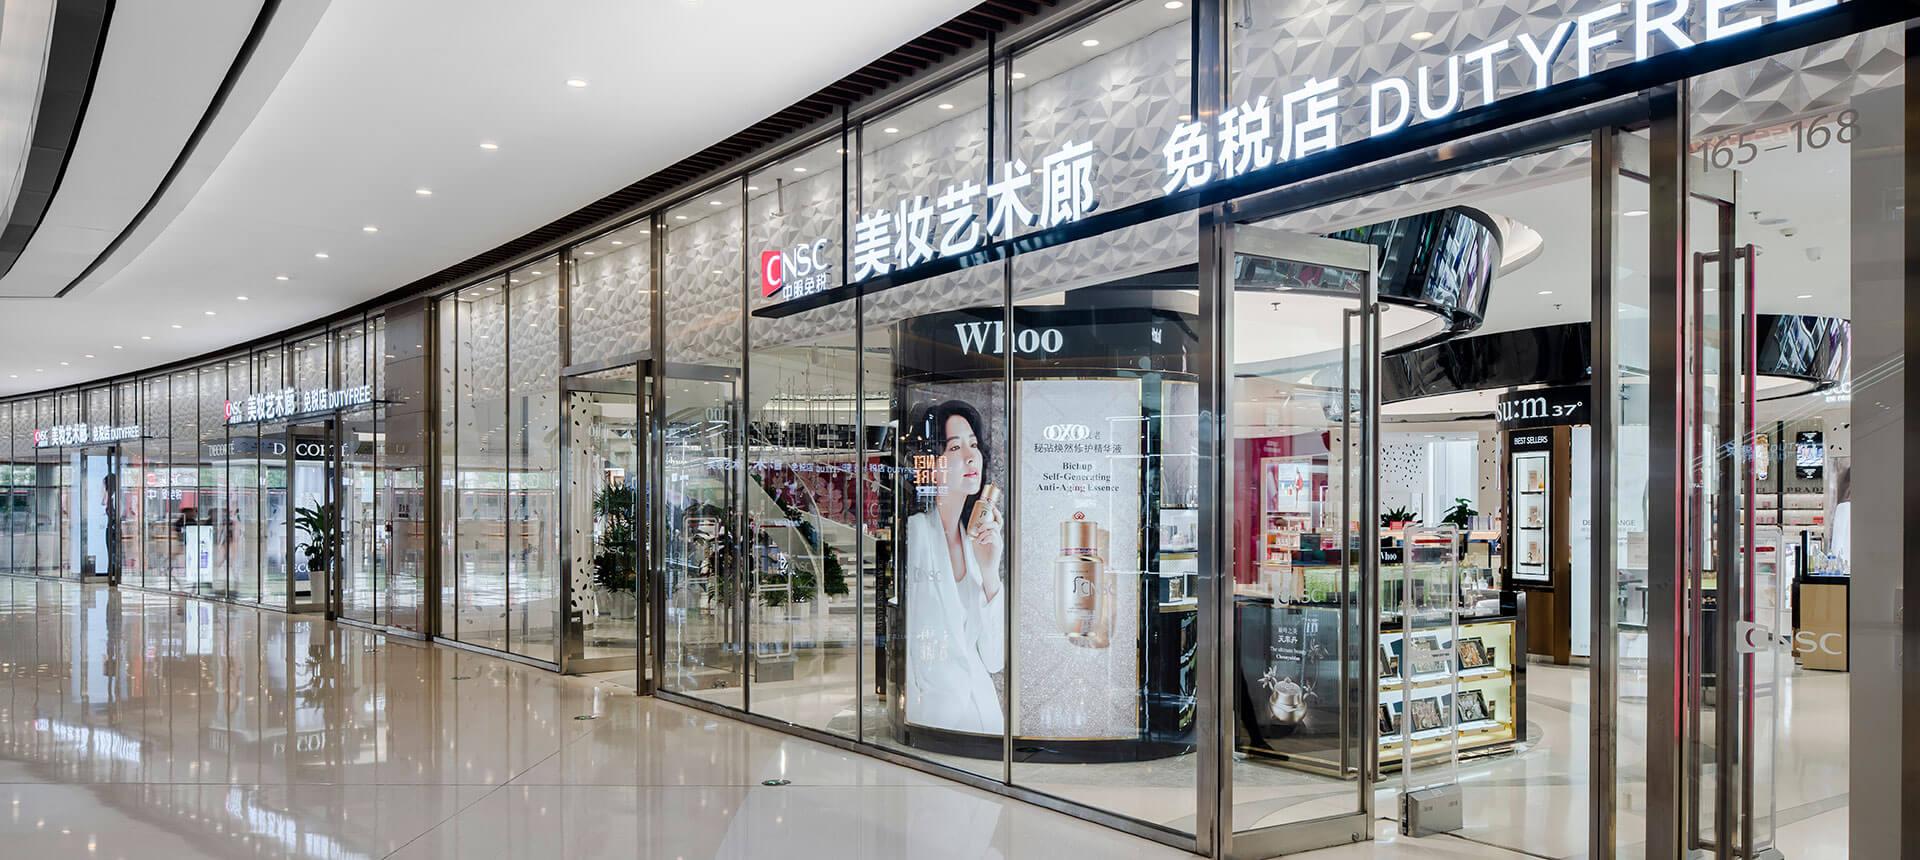 Dalian Duty Free Shop 1